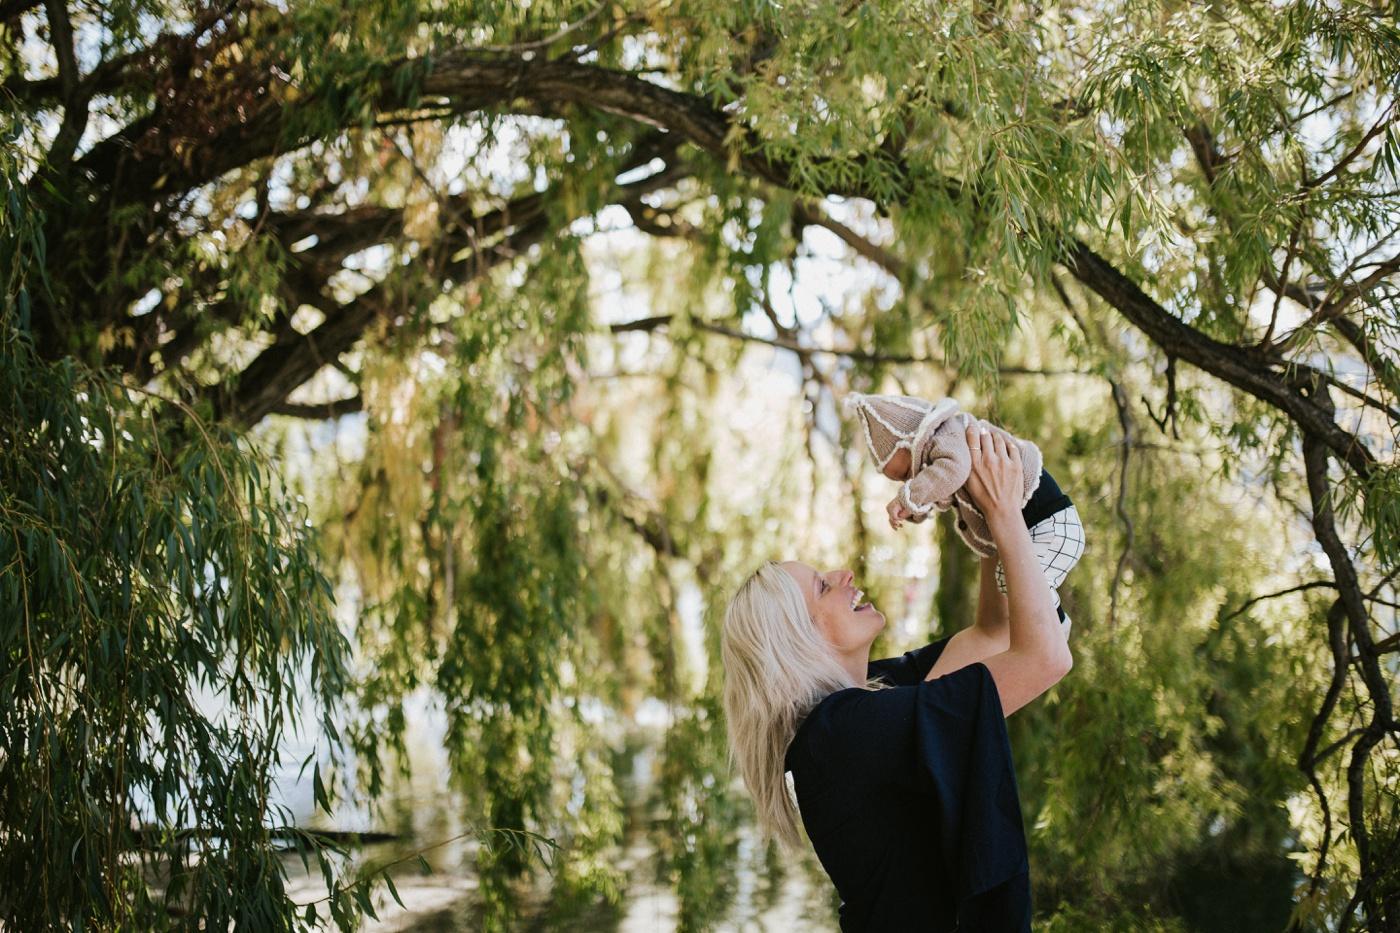 Blake-Lily-Rolig-Lekfull-Familjesession-Familjefotograf-Stockholm-Orebro_19